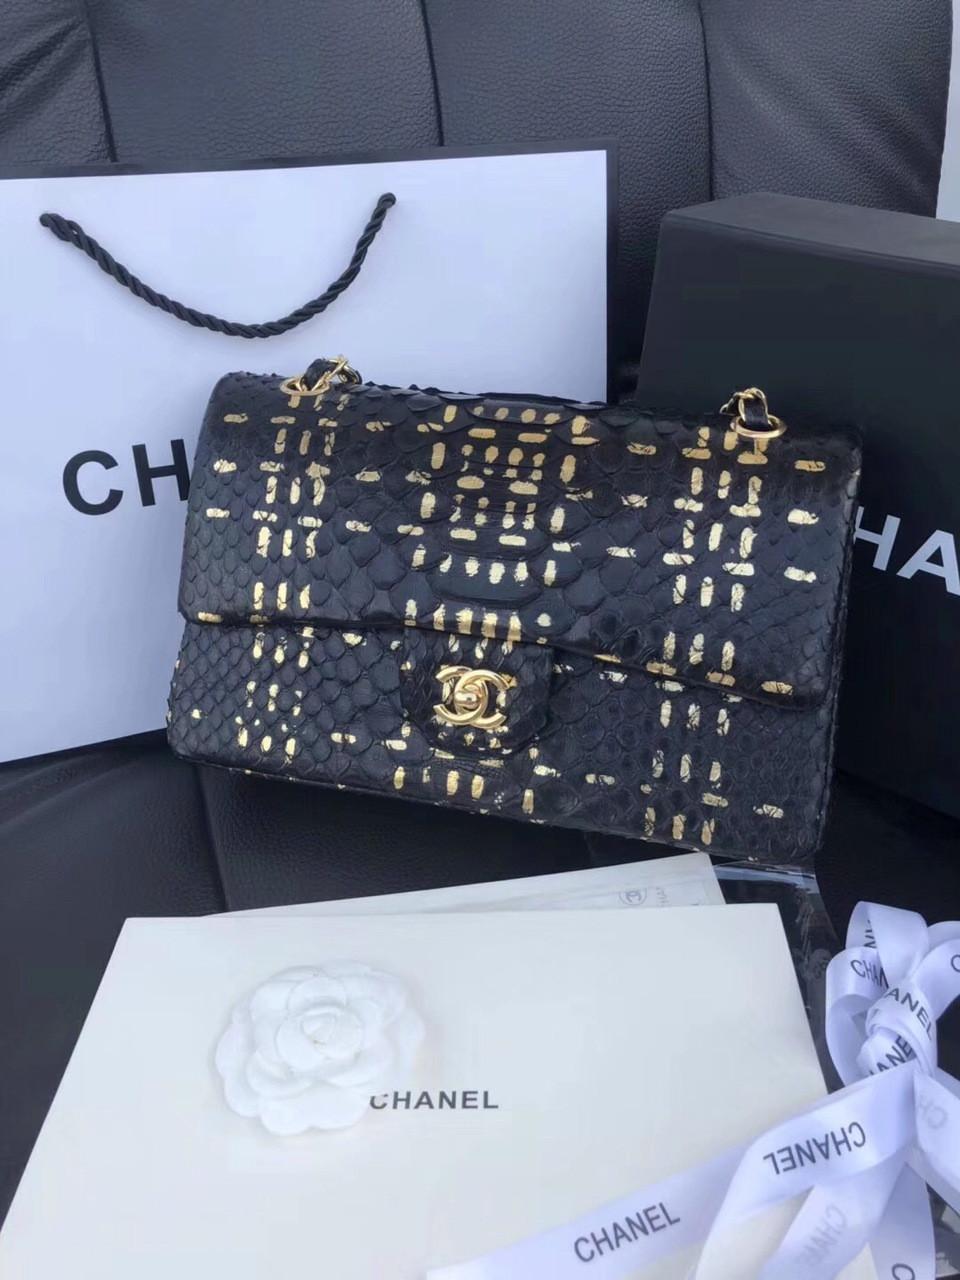 06a4c4b4c1c0 Chanel Classic Handbag with Black Python   Gold Metal - Bella Vita Moda